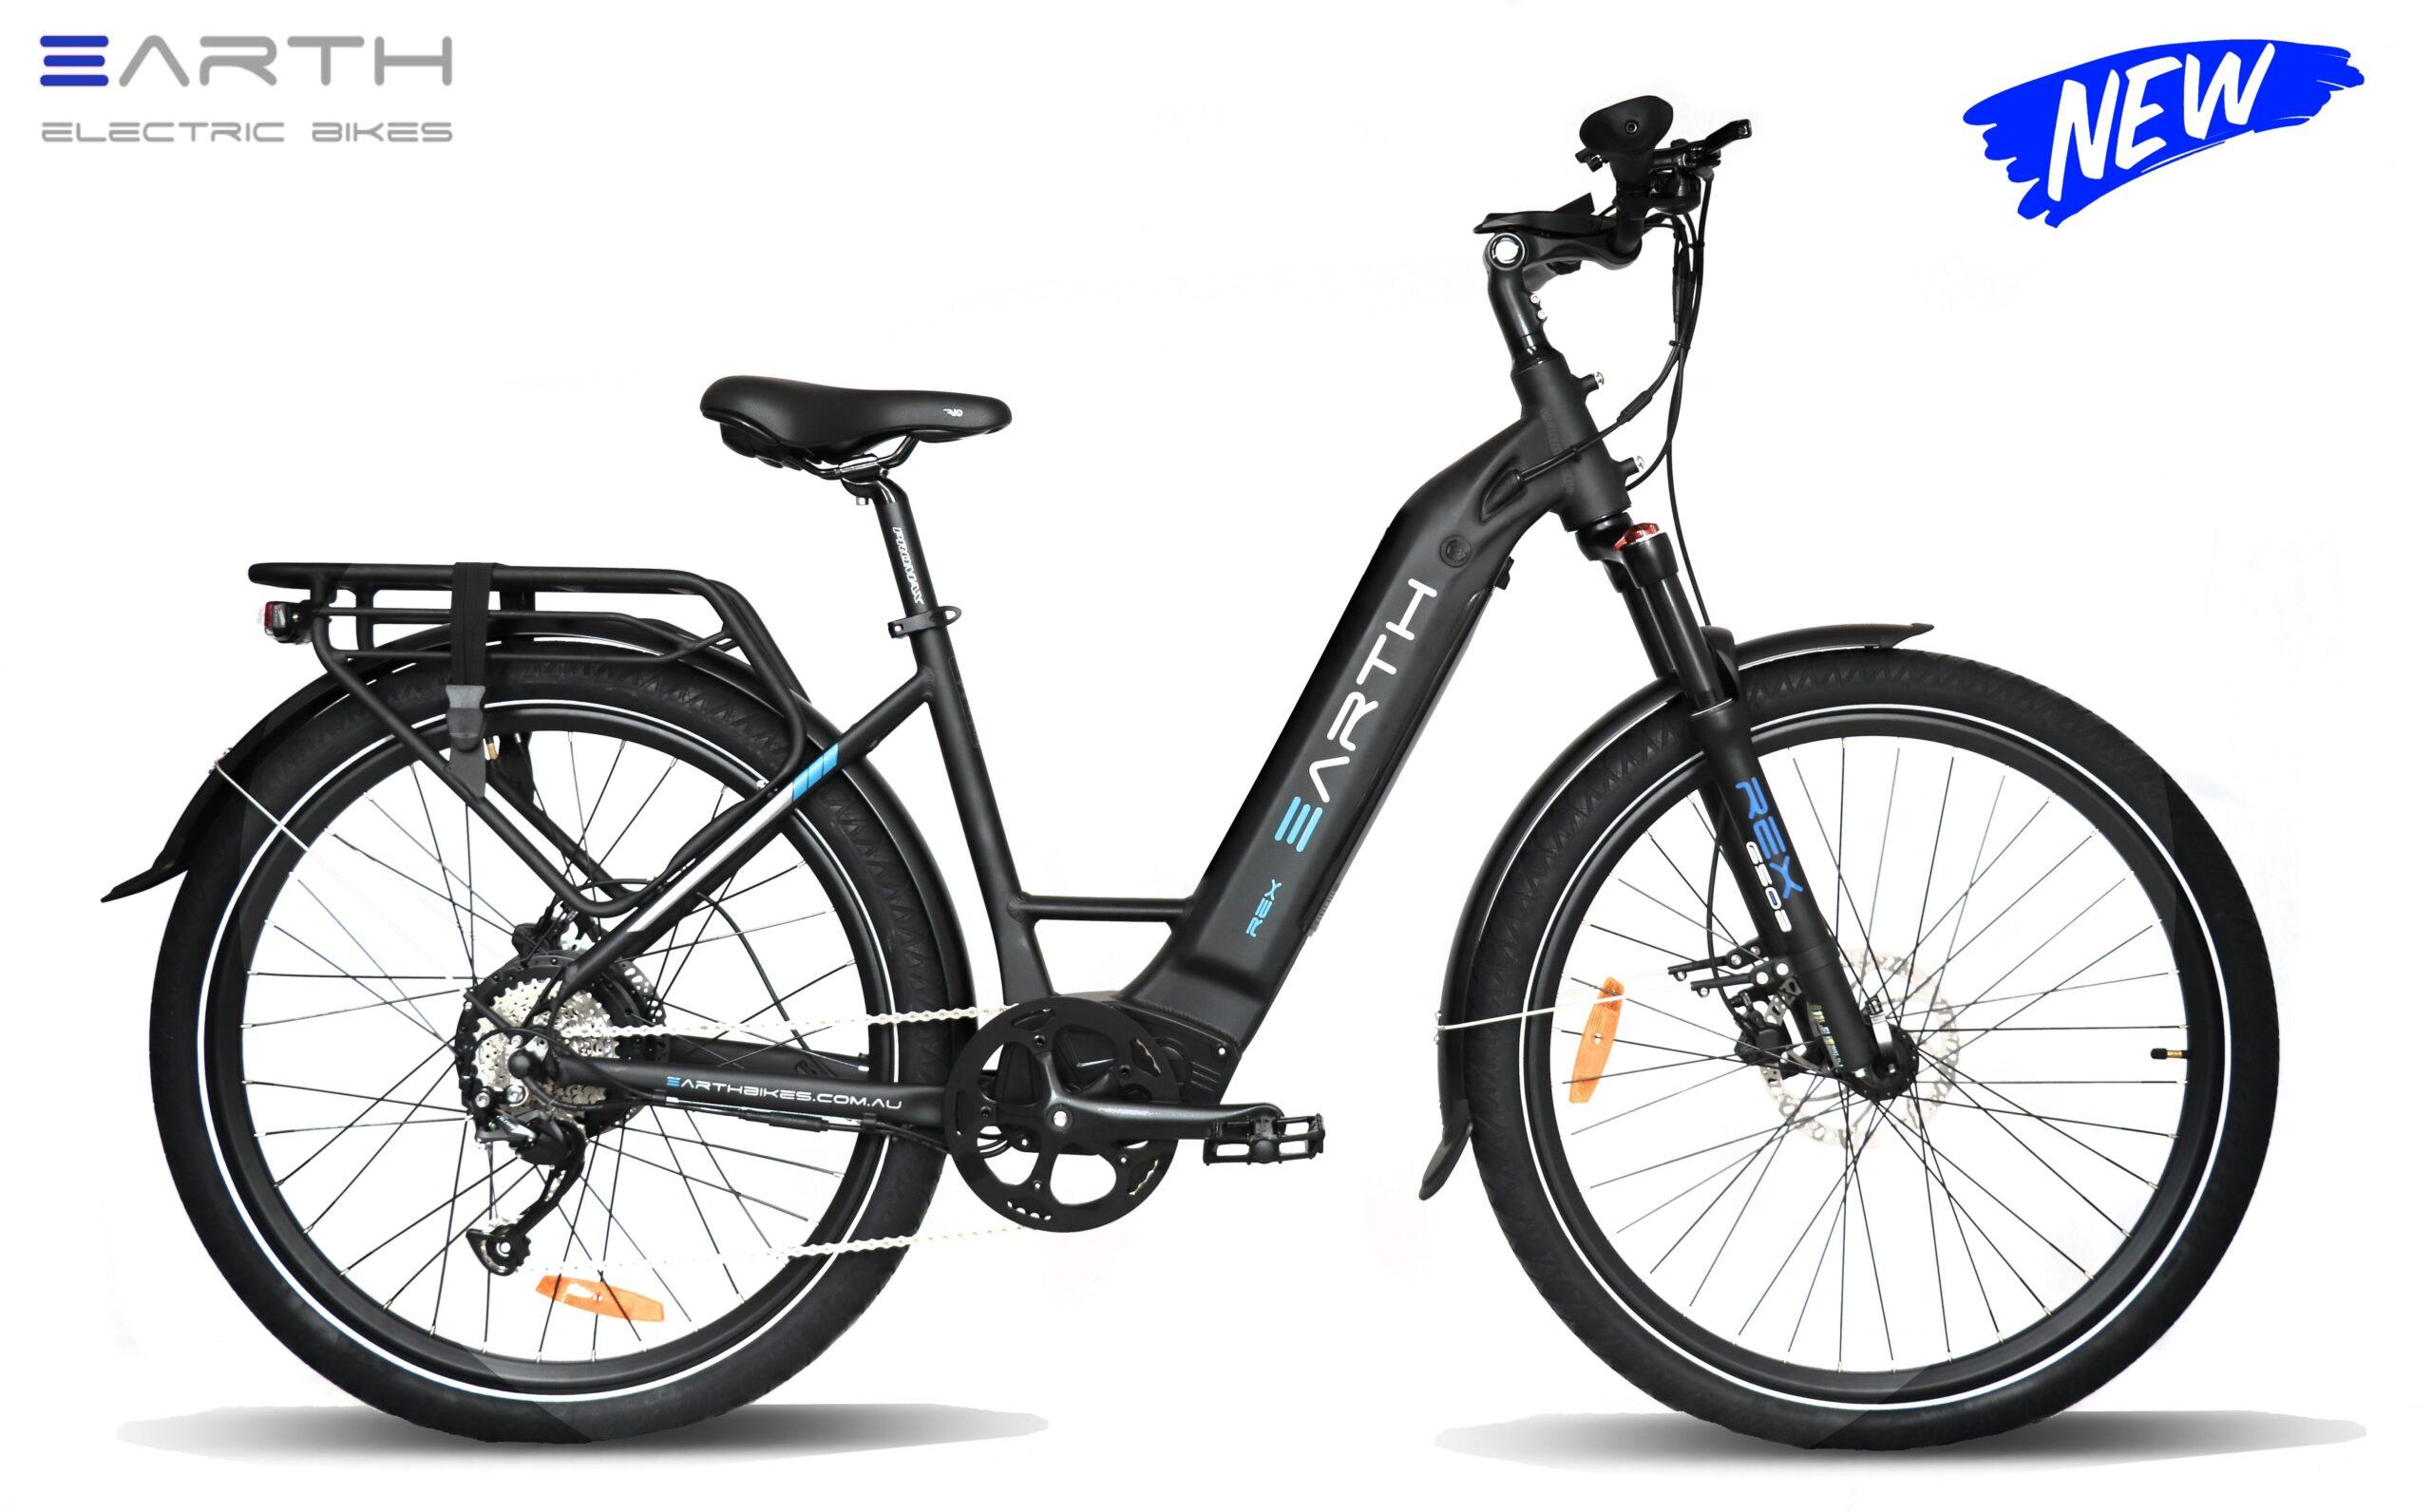 Earth Rex Mixie Touring E Bike 2022